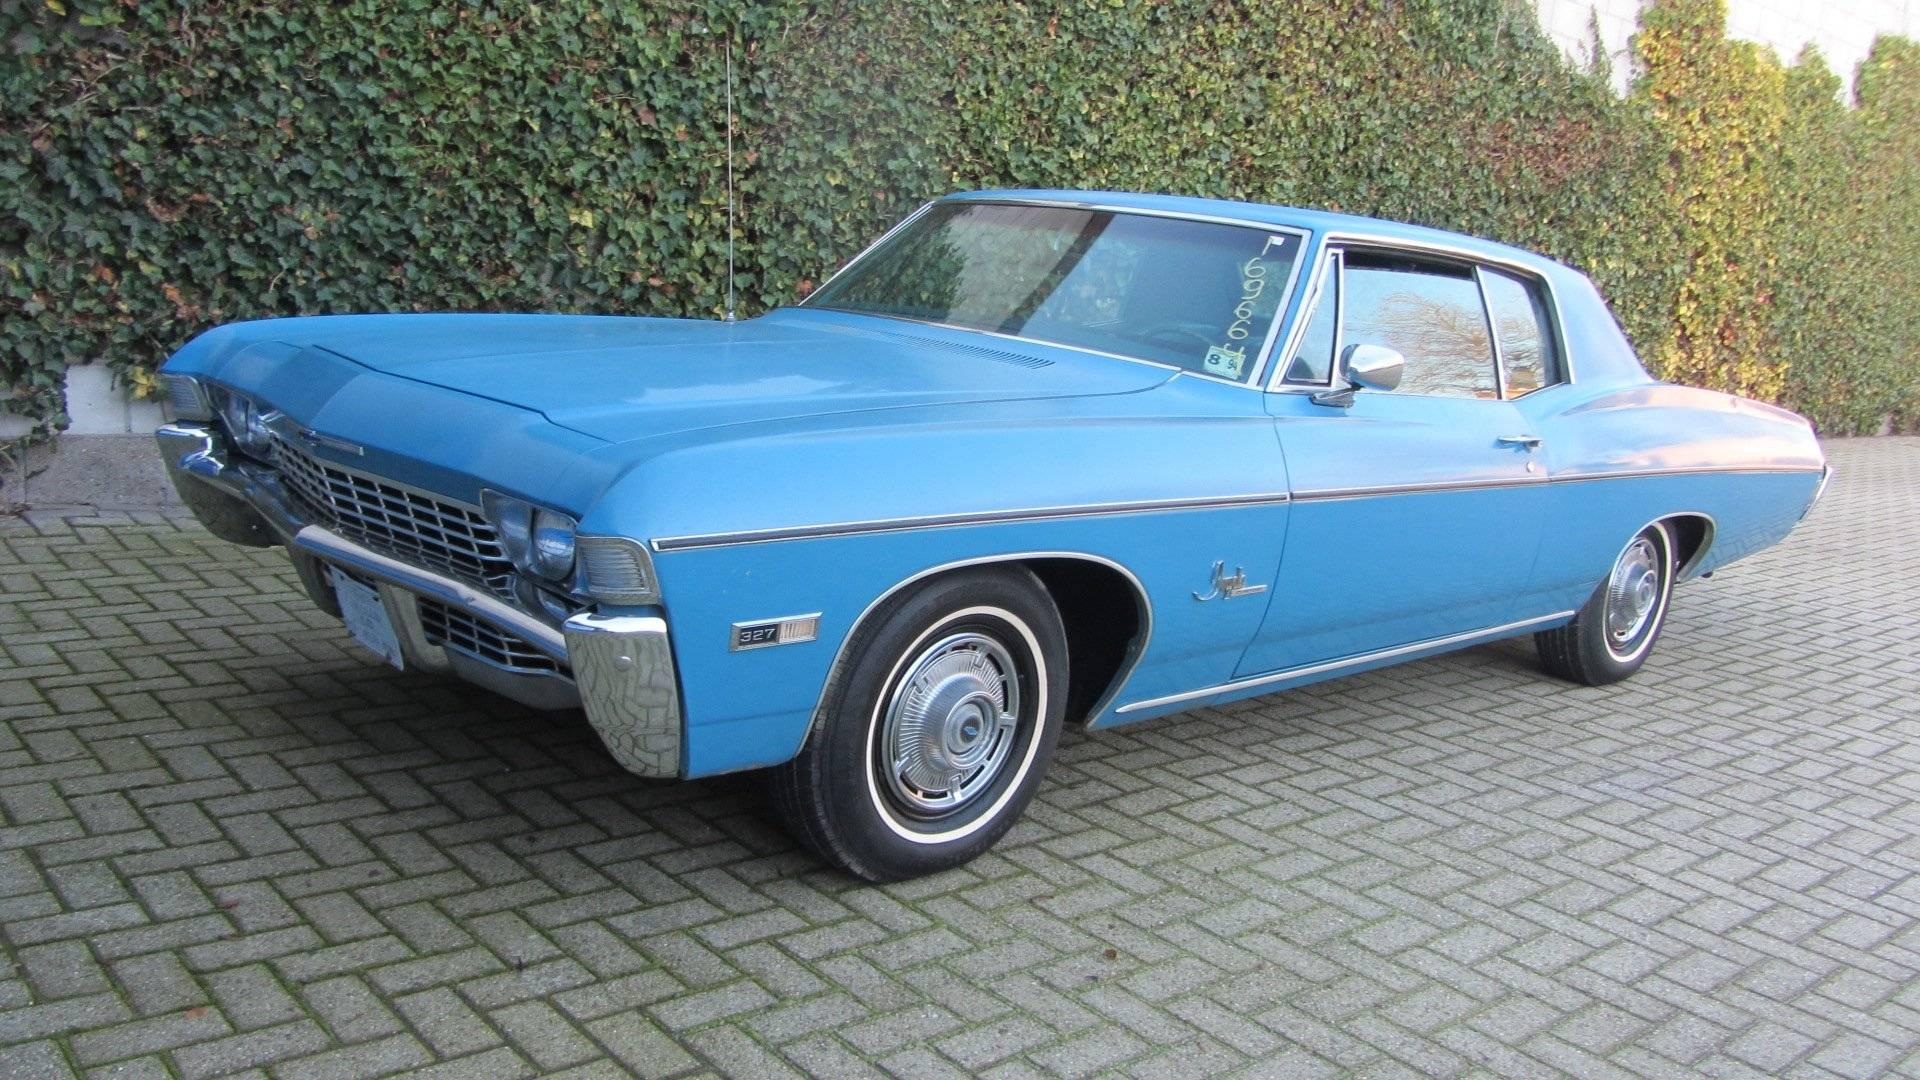 chevrolet impala 1968 f r eur kaufen. Black Bedroom Furniture Sets. Home Design Ideas